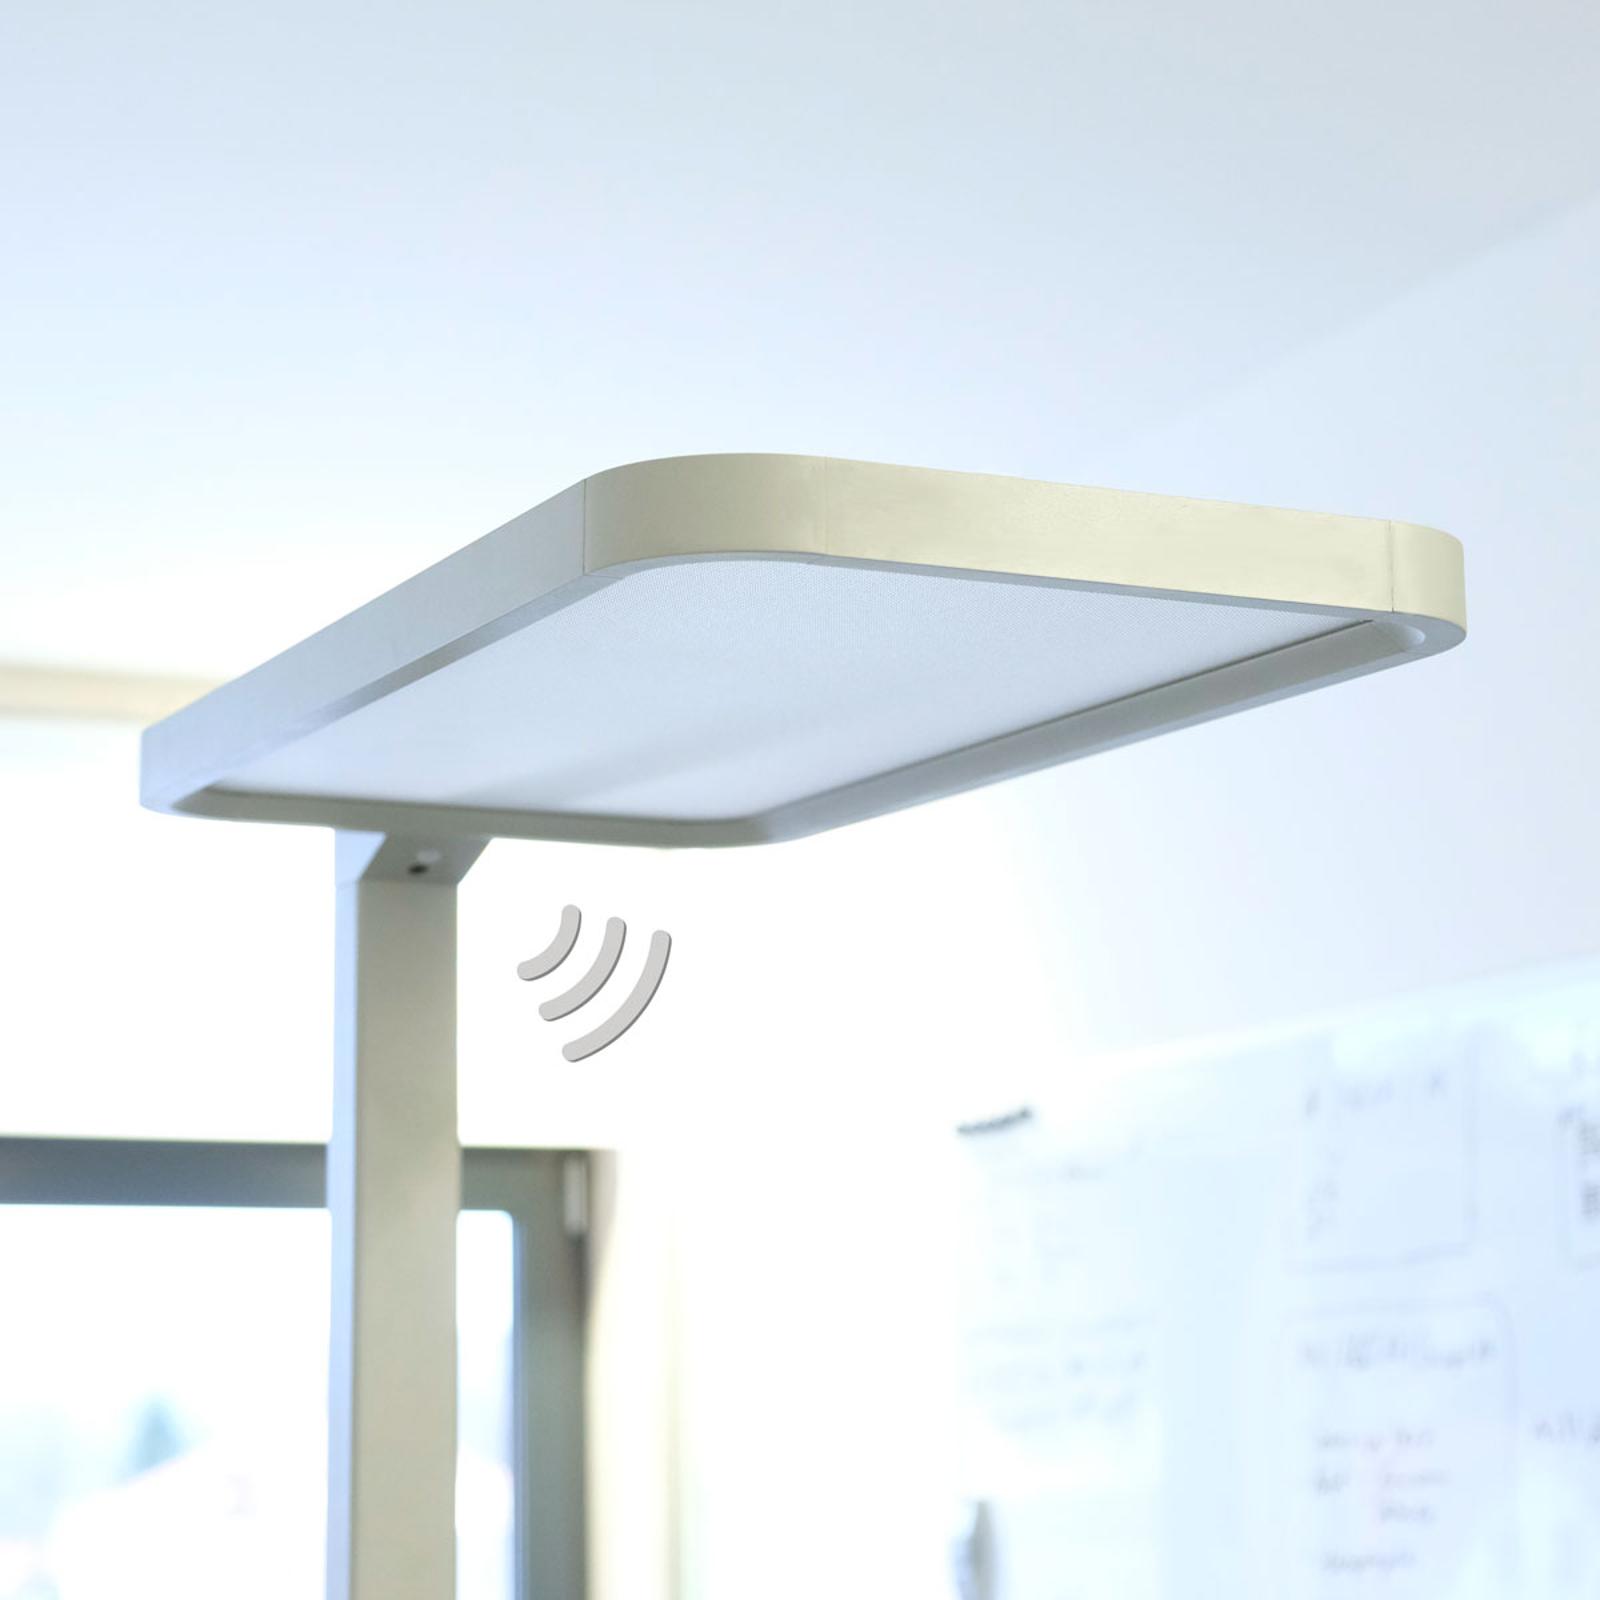 Büro-LED-Stehleuchte Matthis mit Dimmer u. Sensor